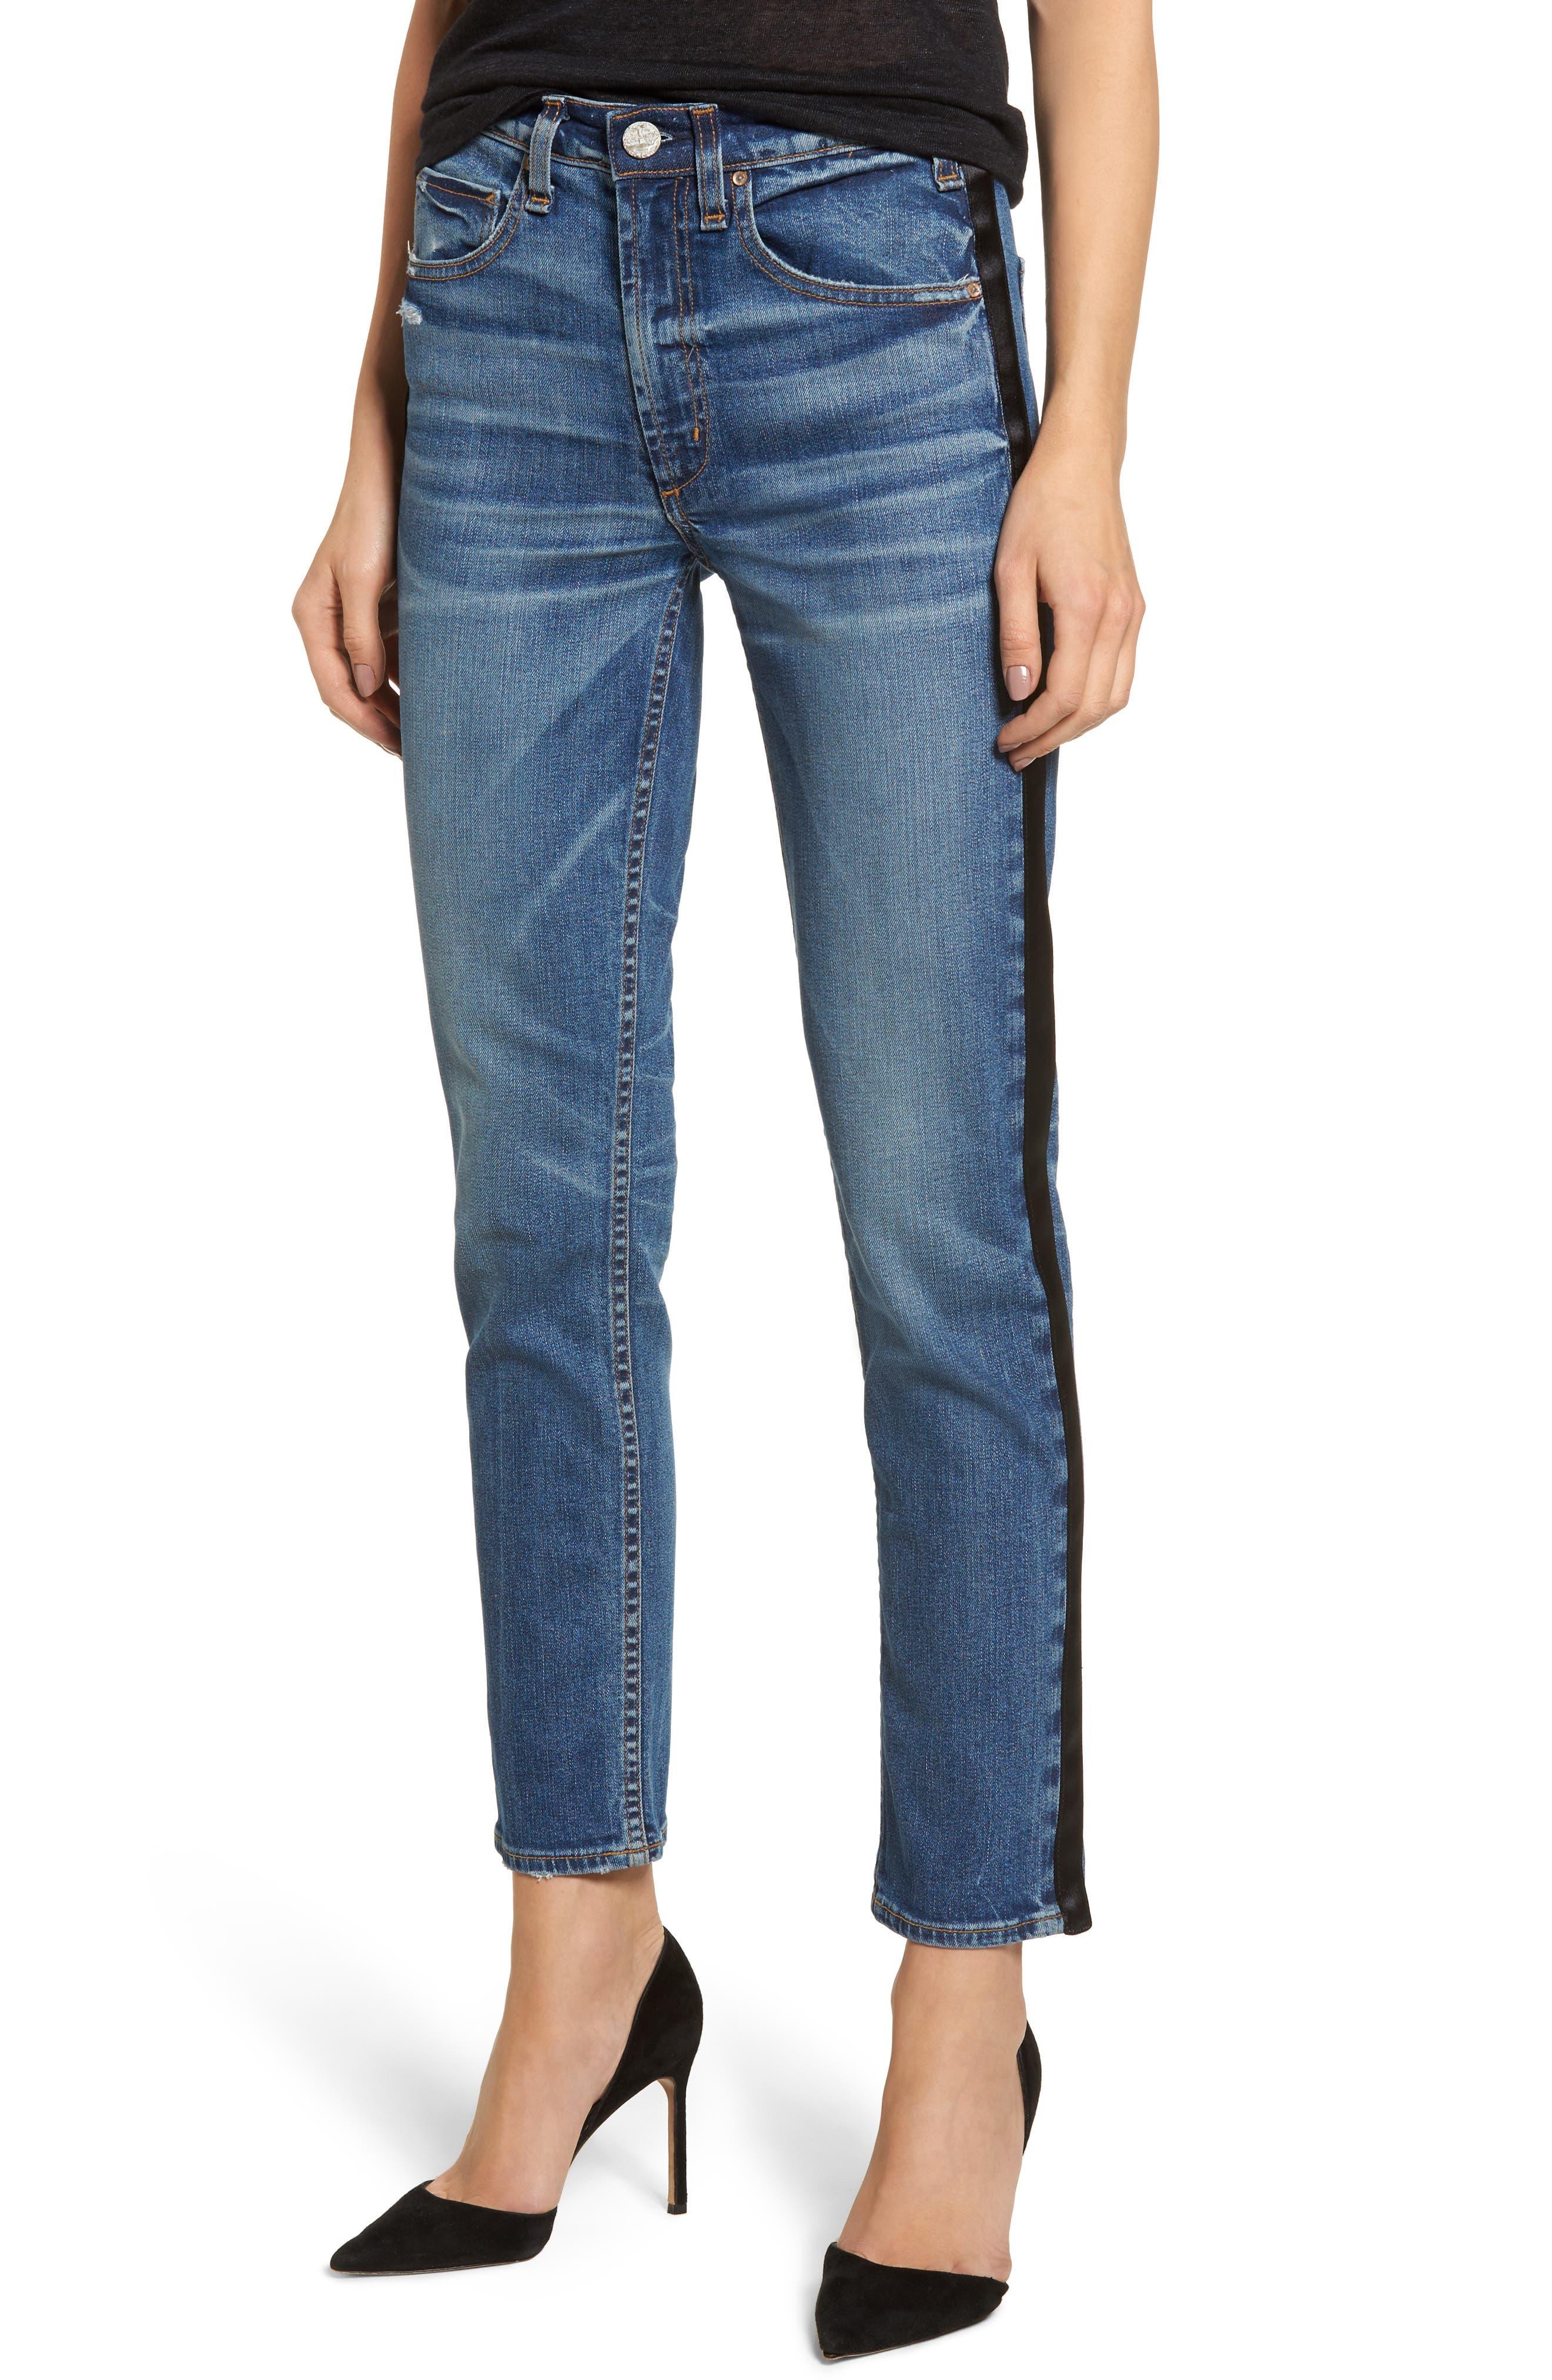 McGuire Vintage Slim Ankle Jeans (Garcon)